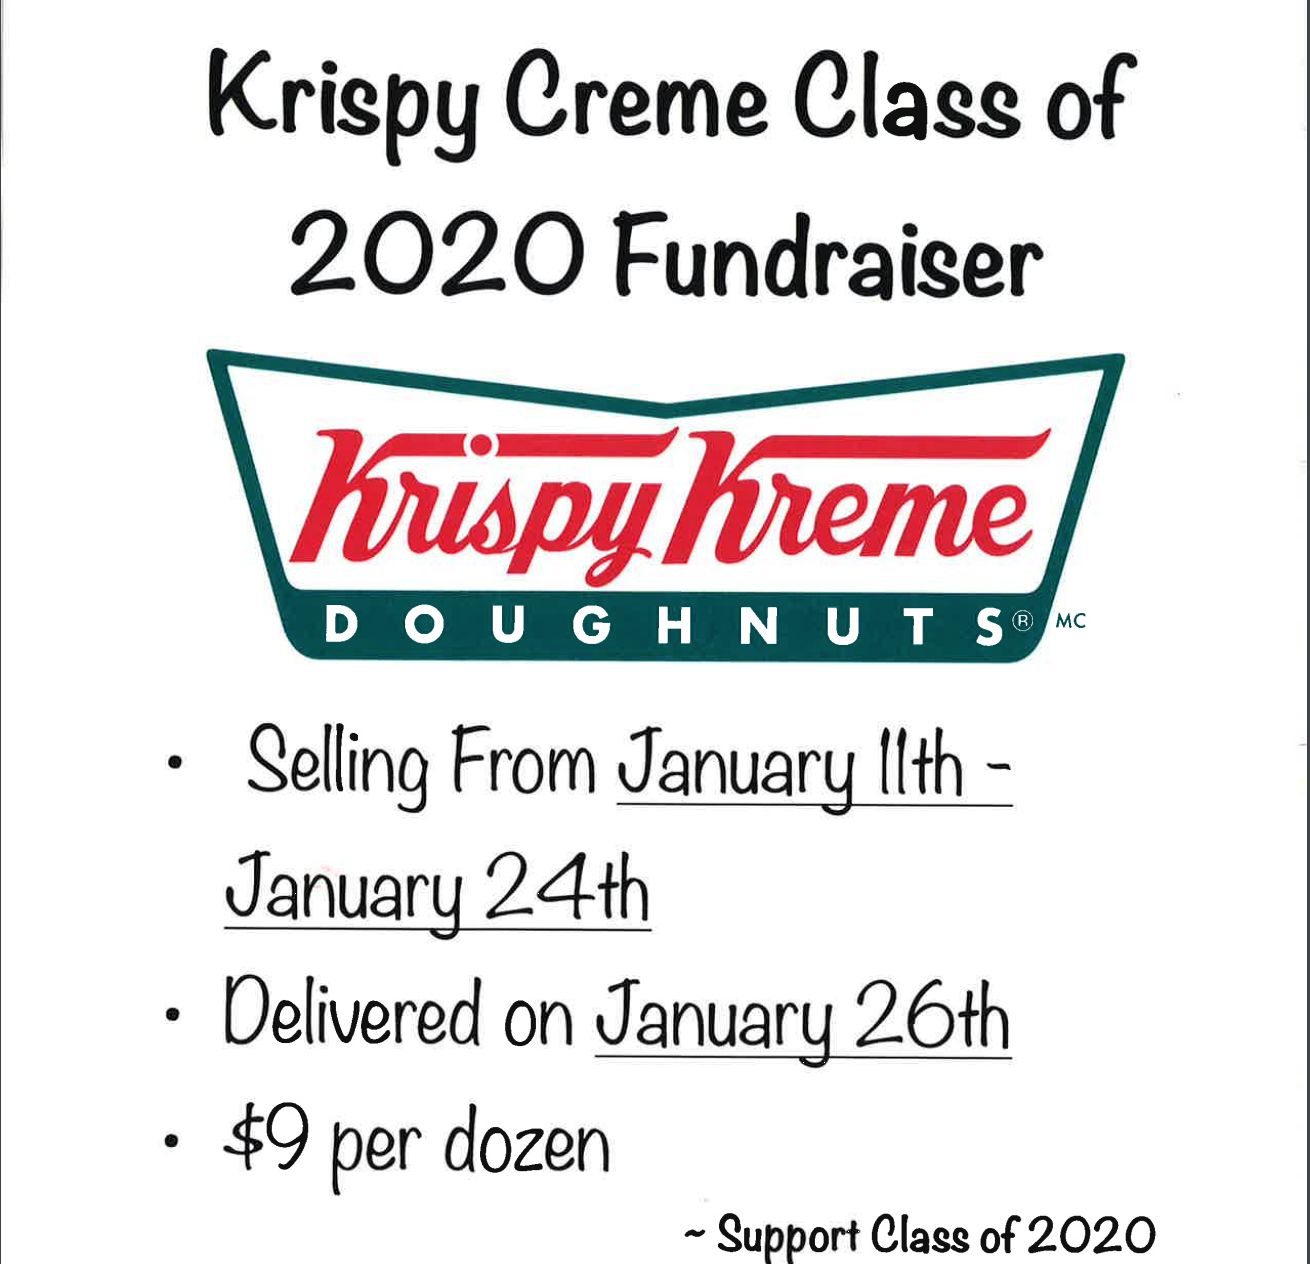 class of 2020 krispy creme fundraiser